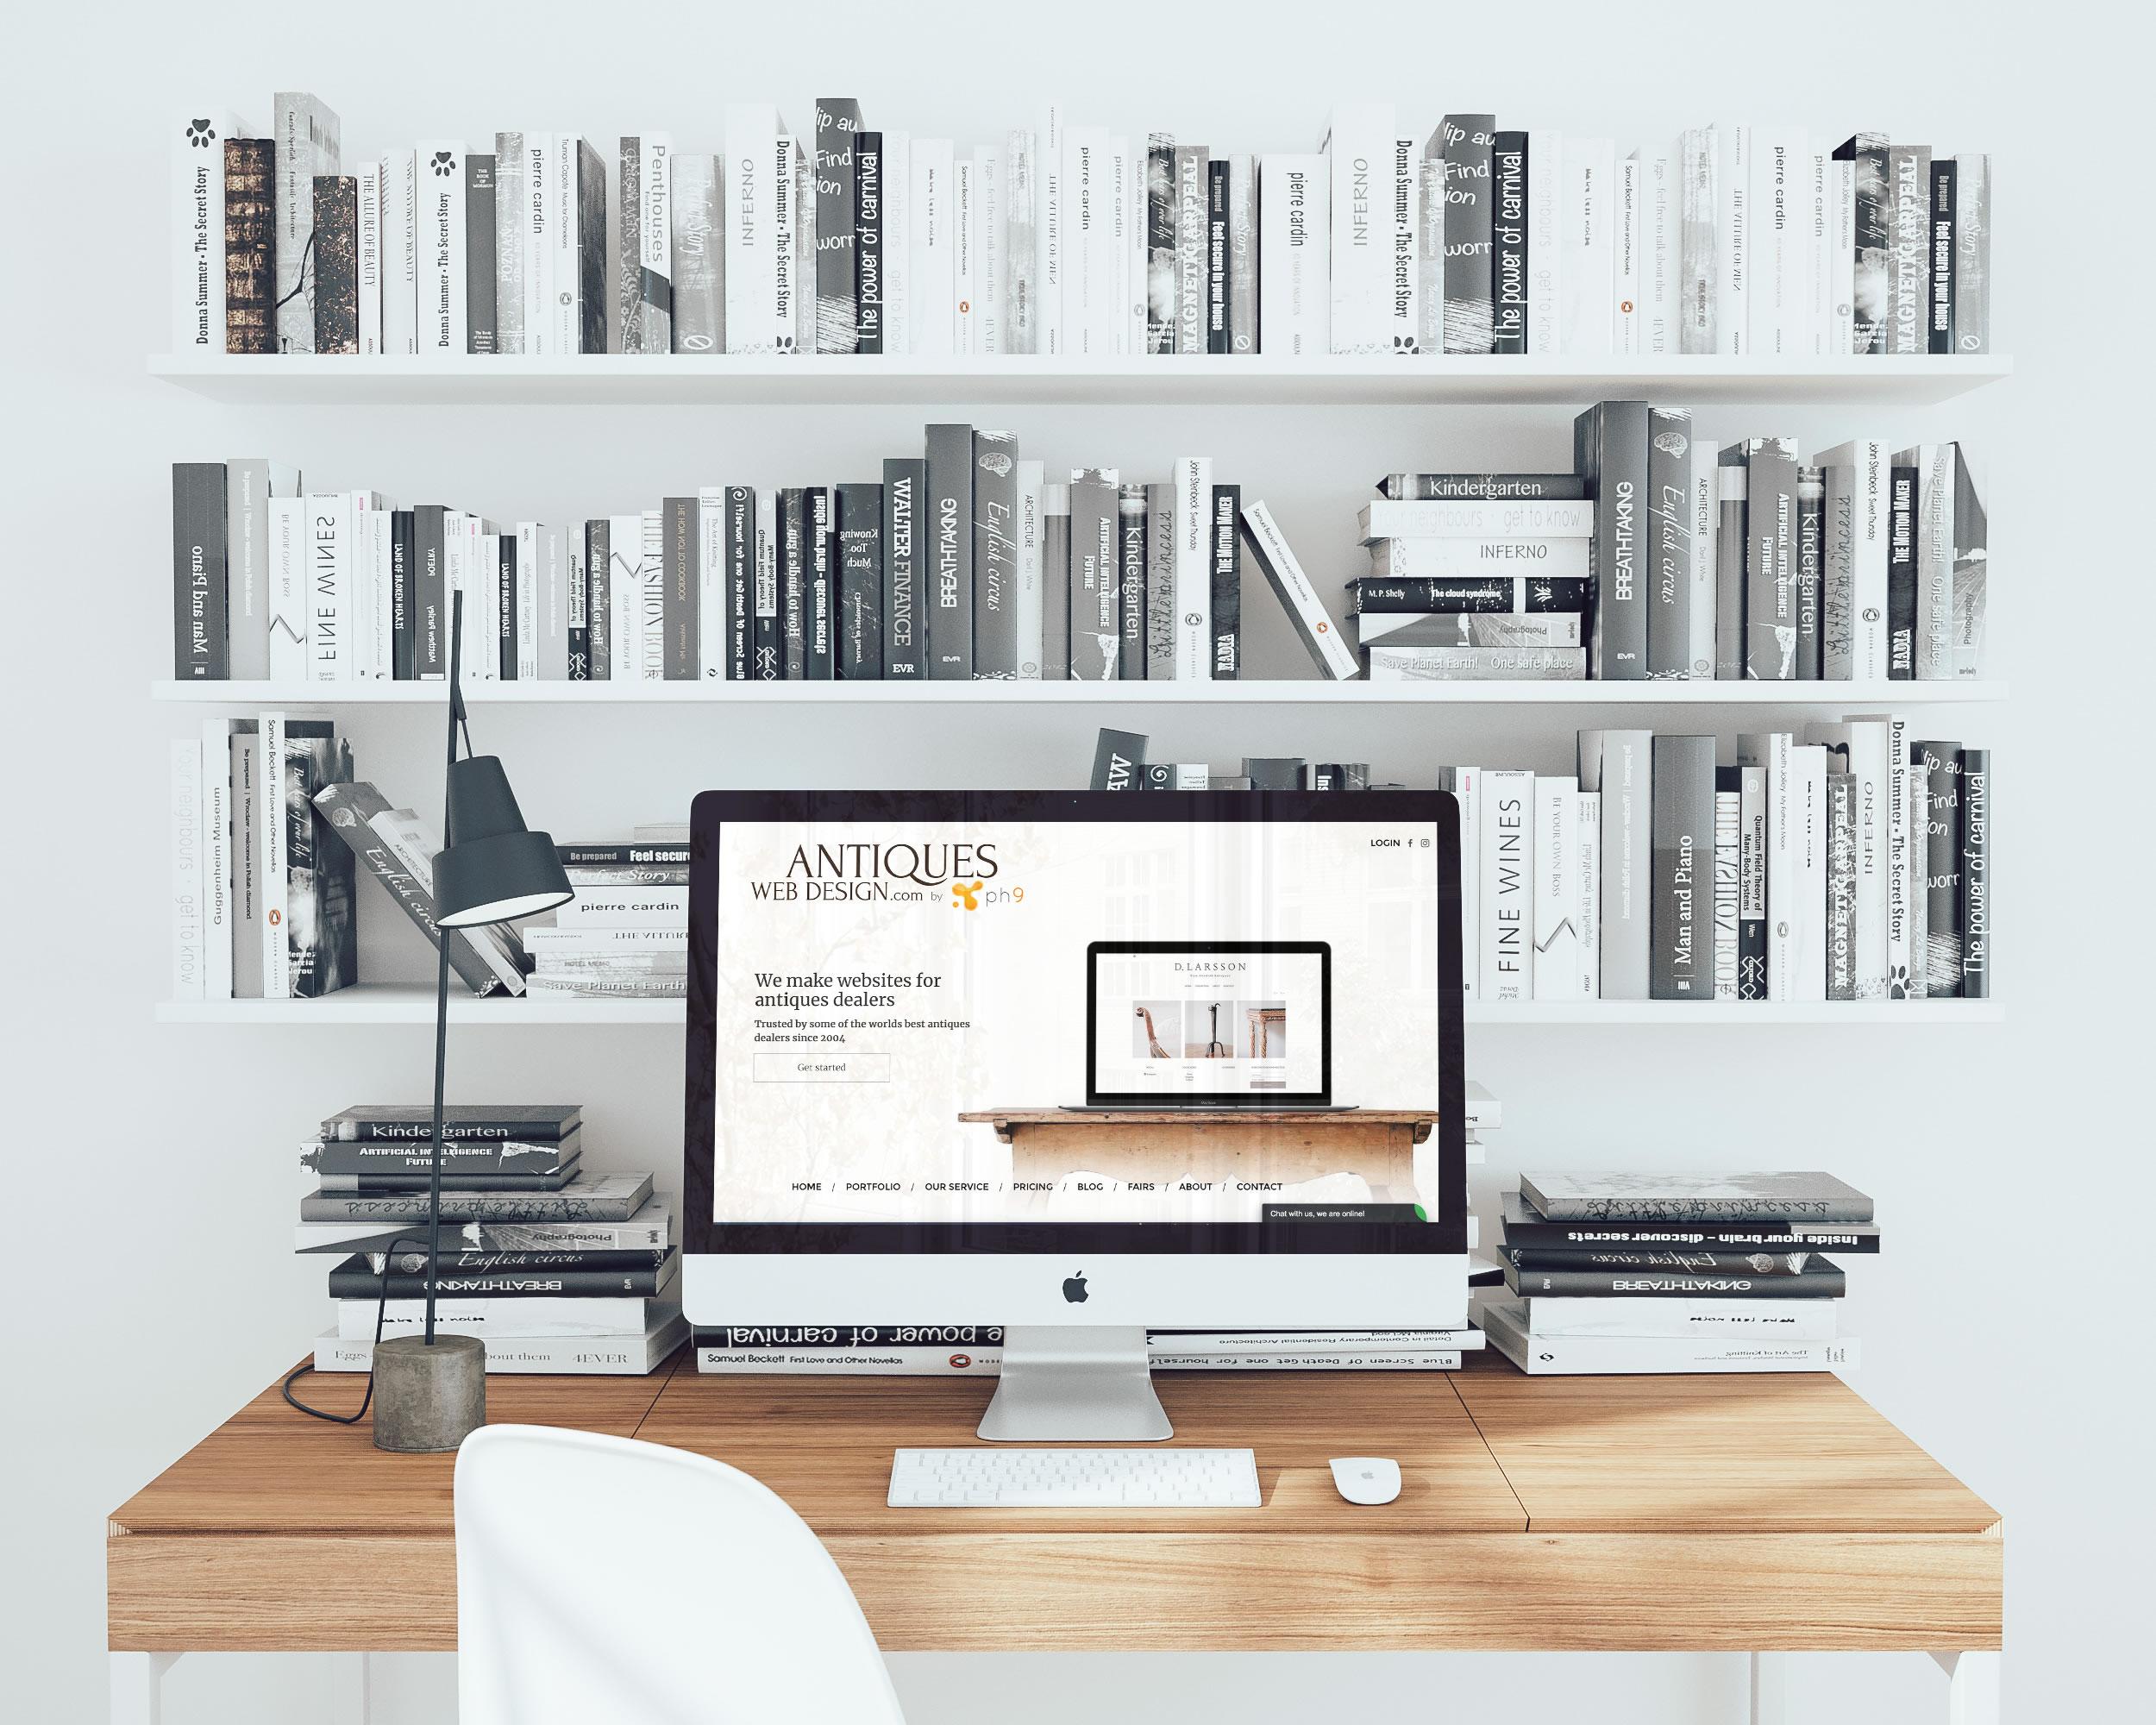 Antiques Web Design